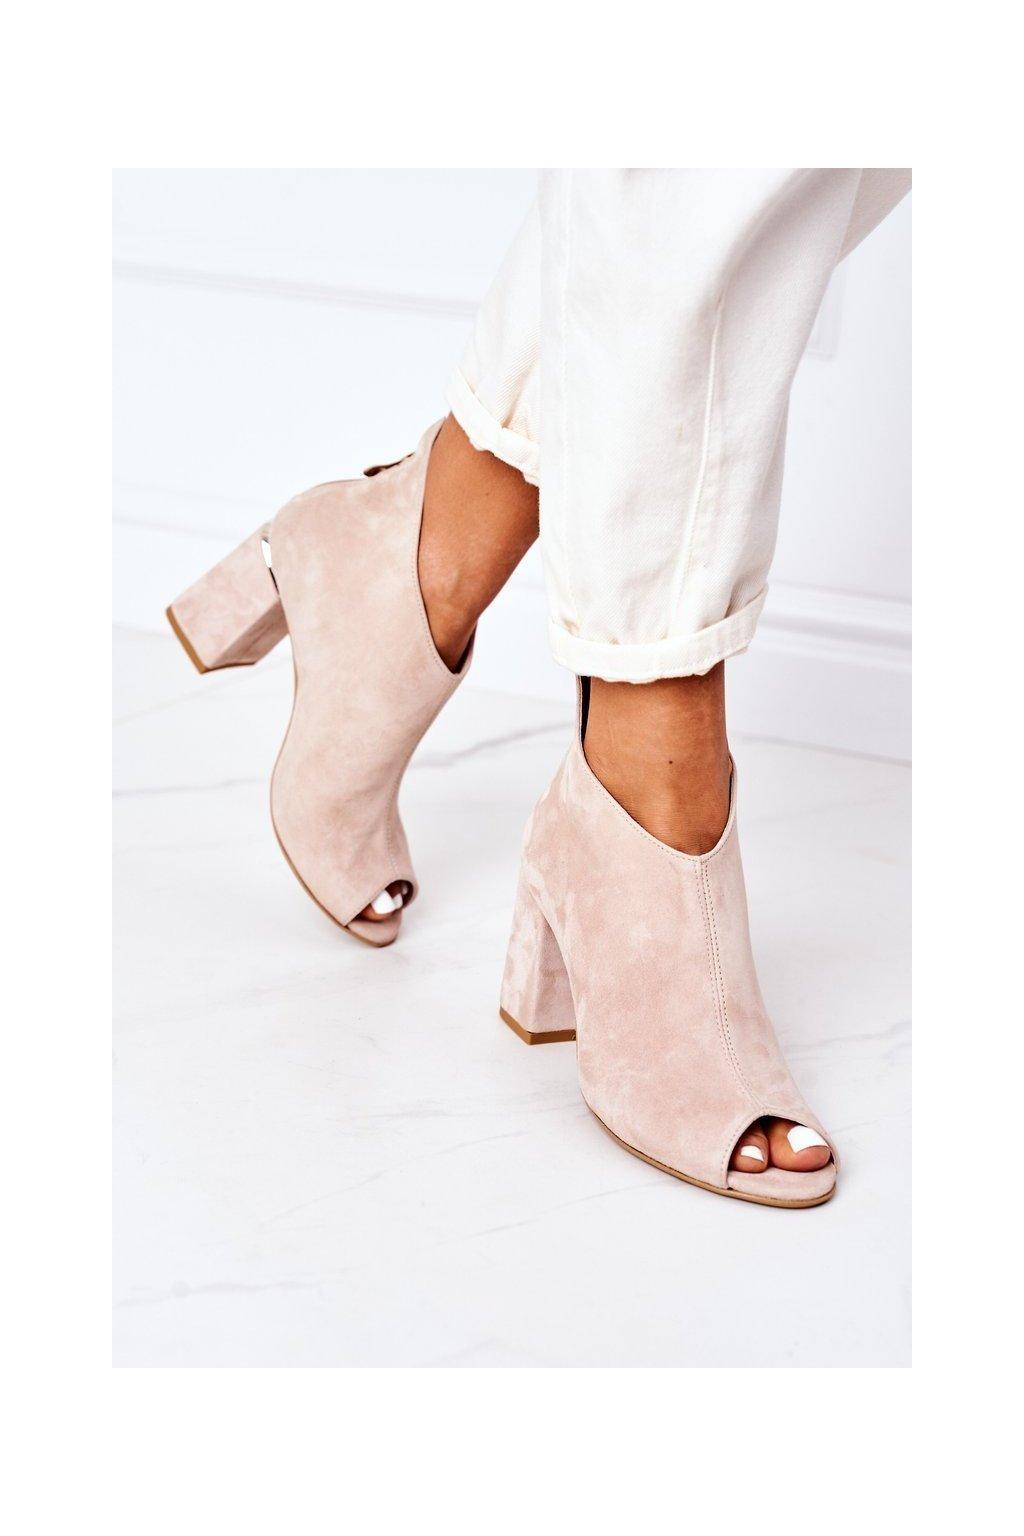 Členkové topánky na podpätku farba hnedá kód obuvi 3044 BEŻ ZAMSZ